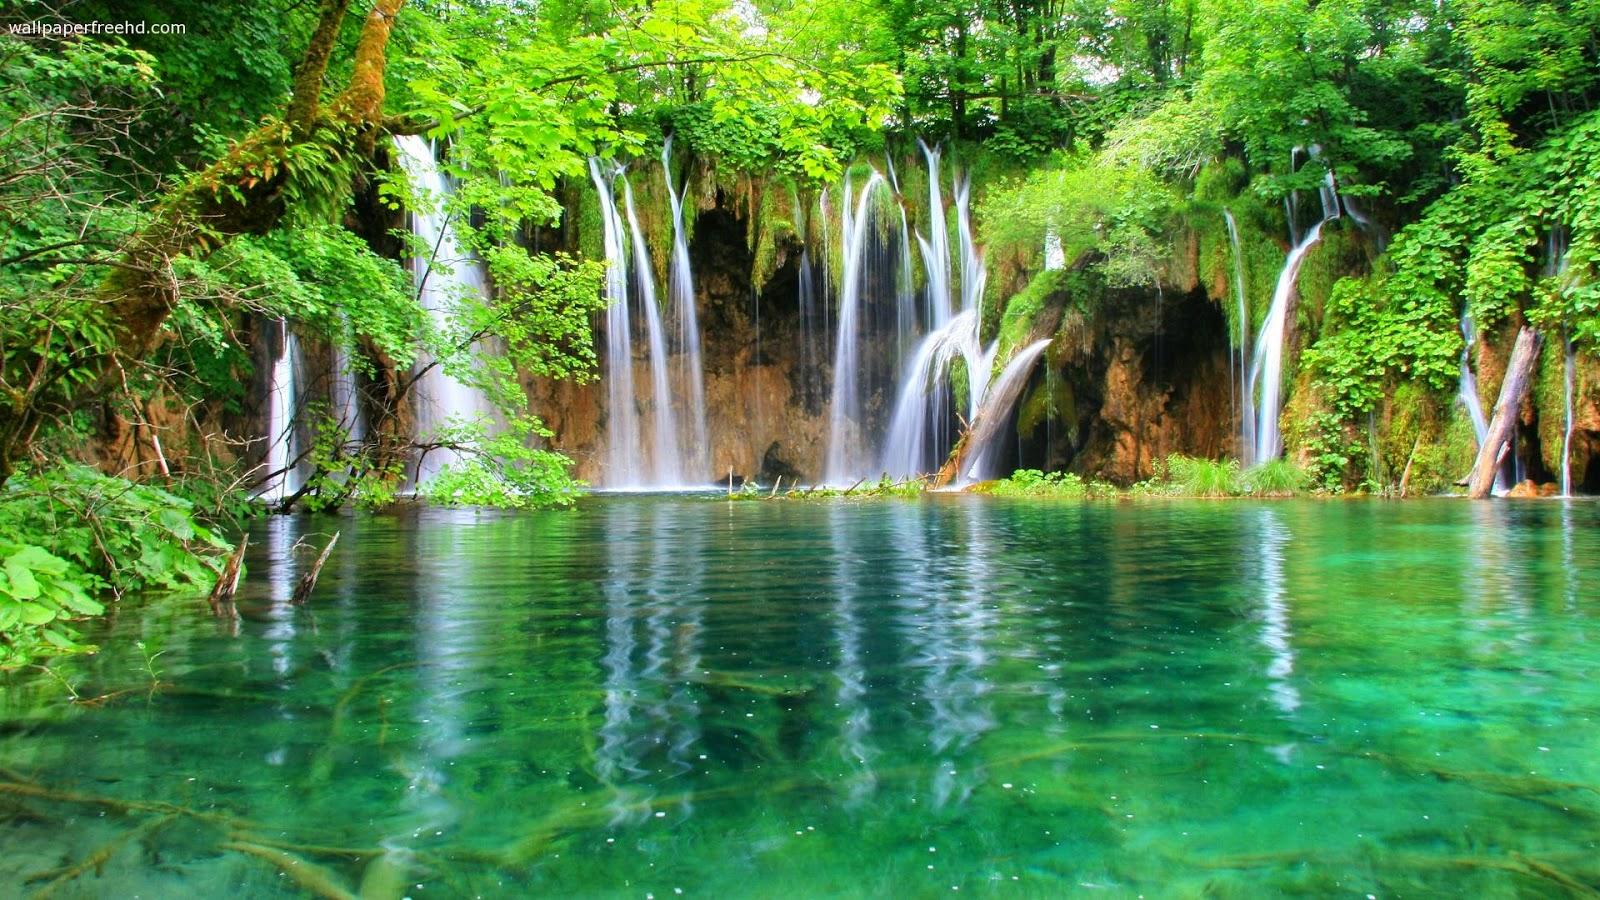 Nature Cool Waterfall Hd Wallpaper Mega Wallpapers